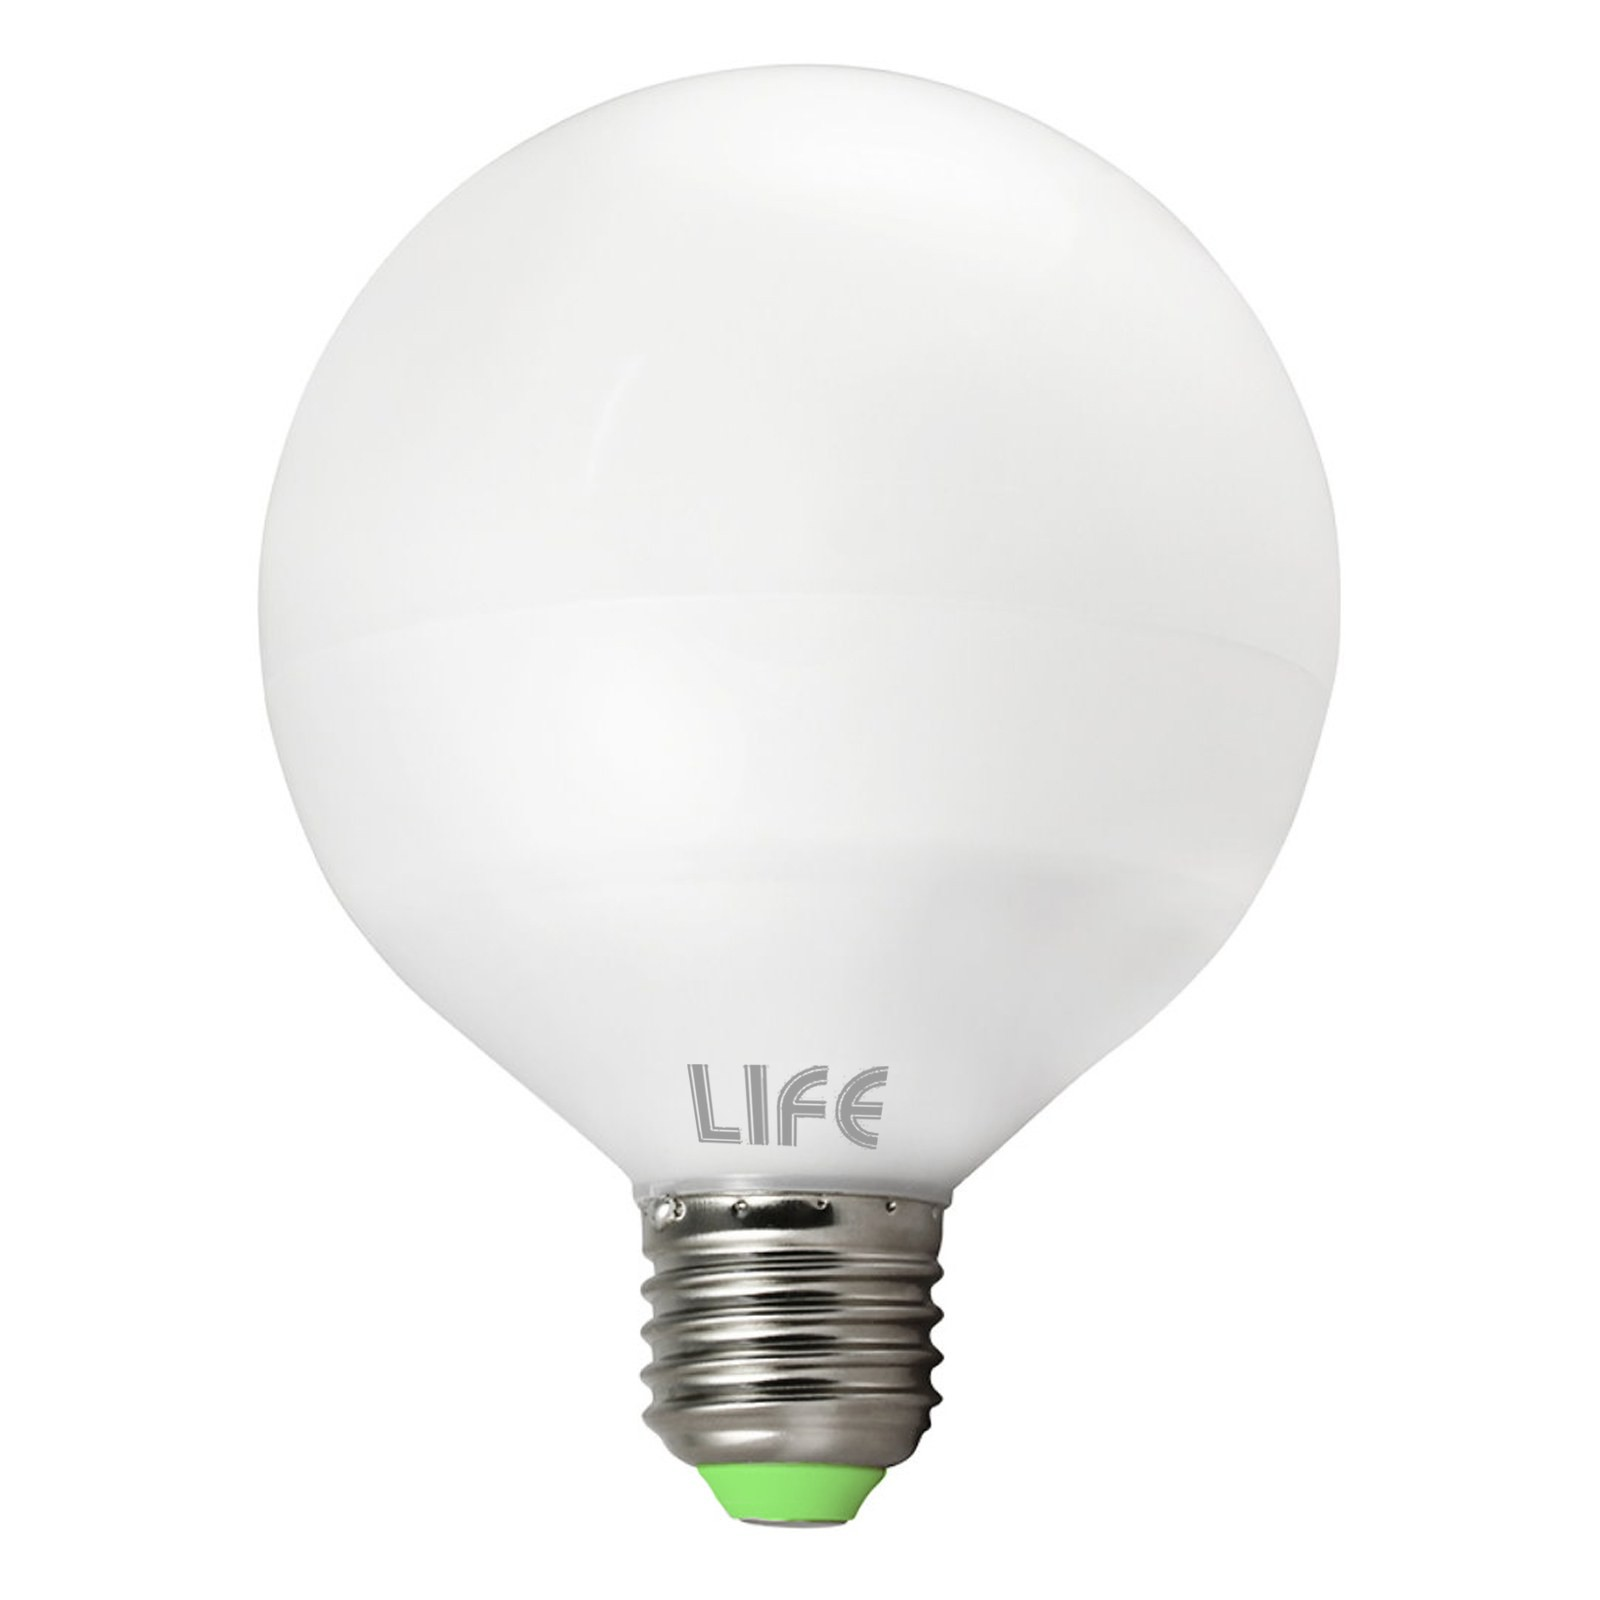 lampadina luce naturale : Lampada Lampadina LED Attacco E27 16 Watt Globo Luce Bianca Naturale ...